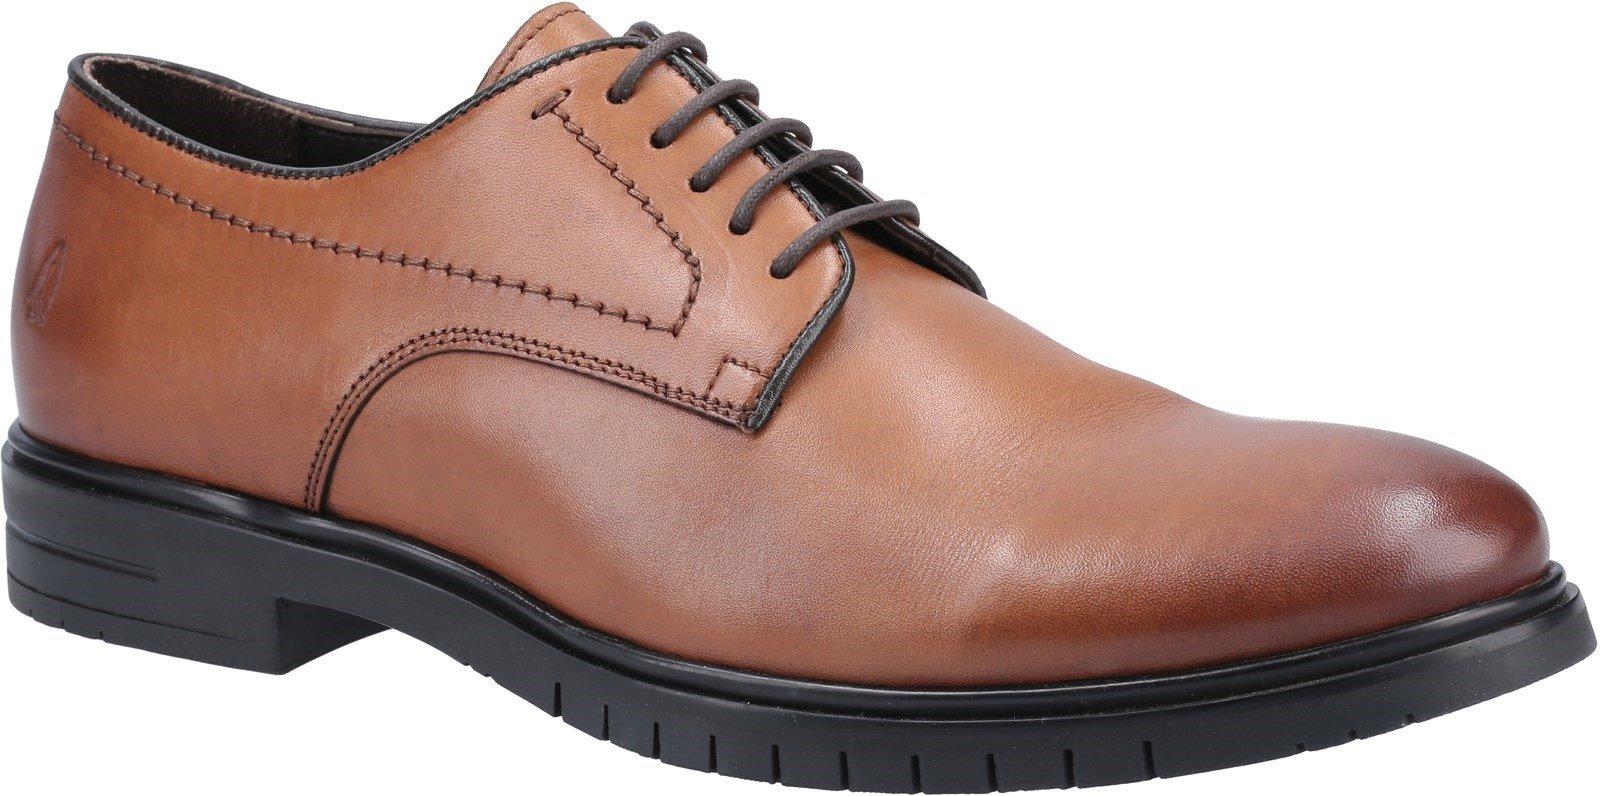 Hush Puppies Men's Sterling Lace Brogue Shoe Tan 31992 - Tan 6